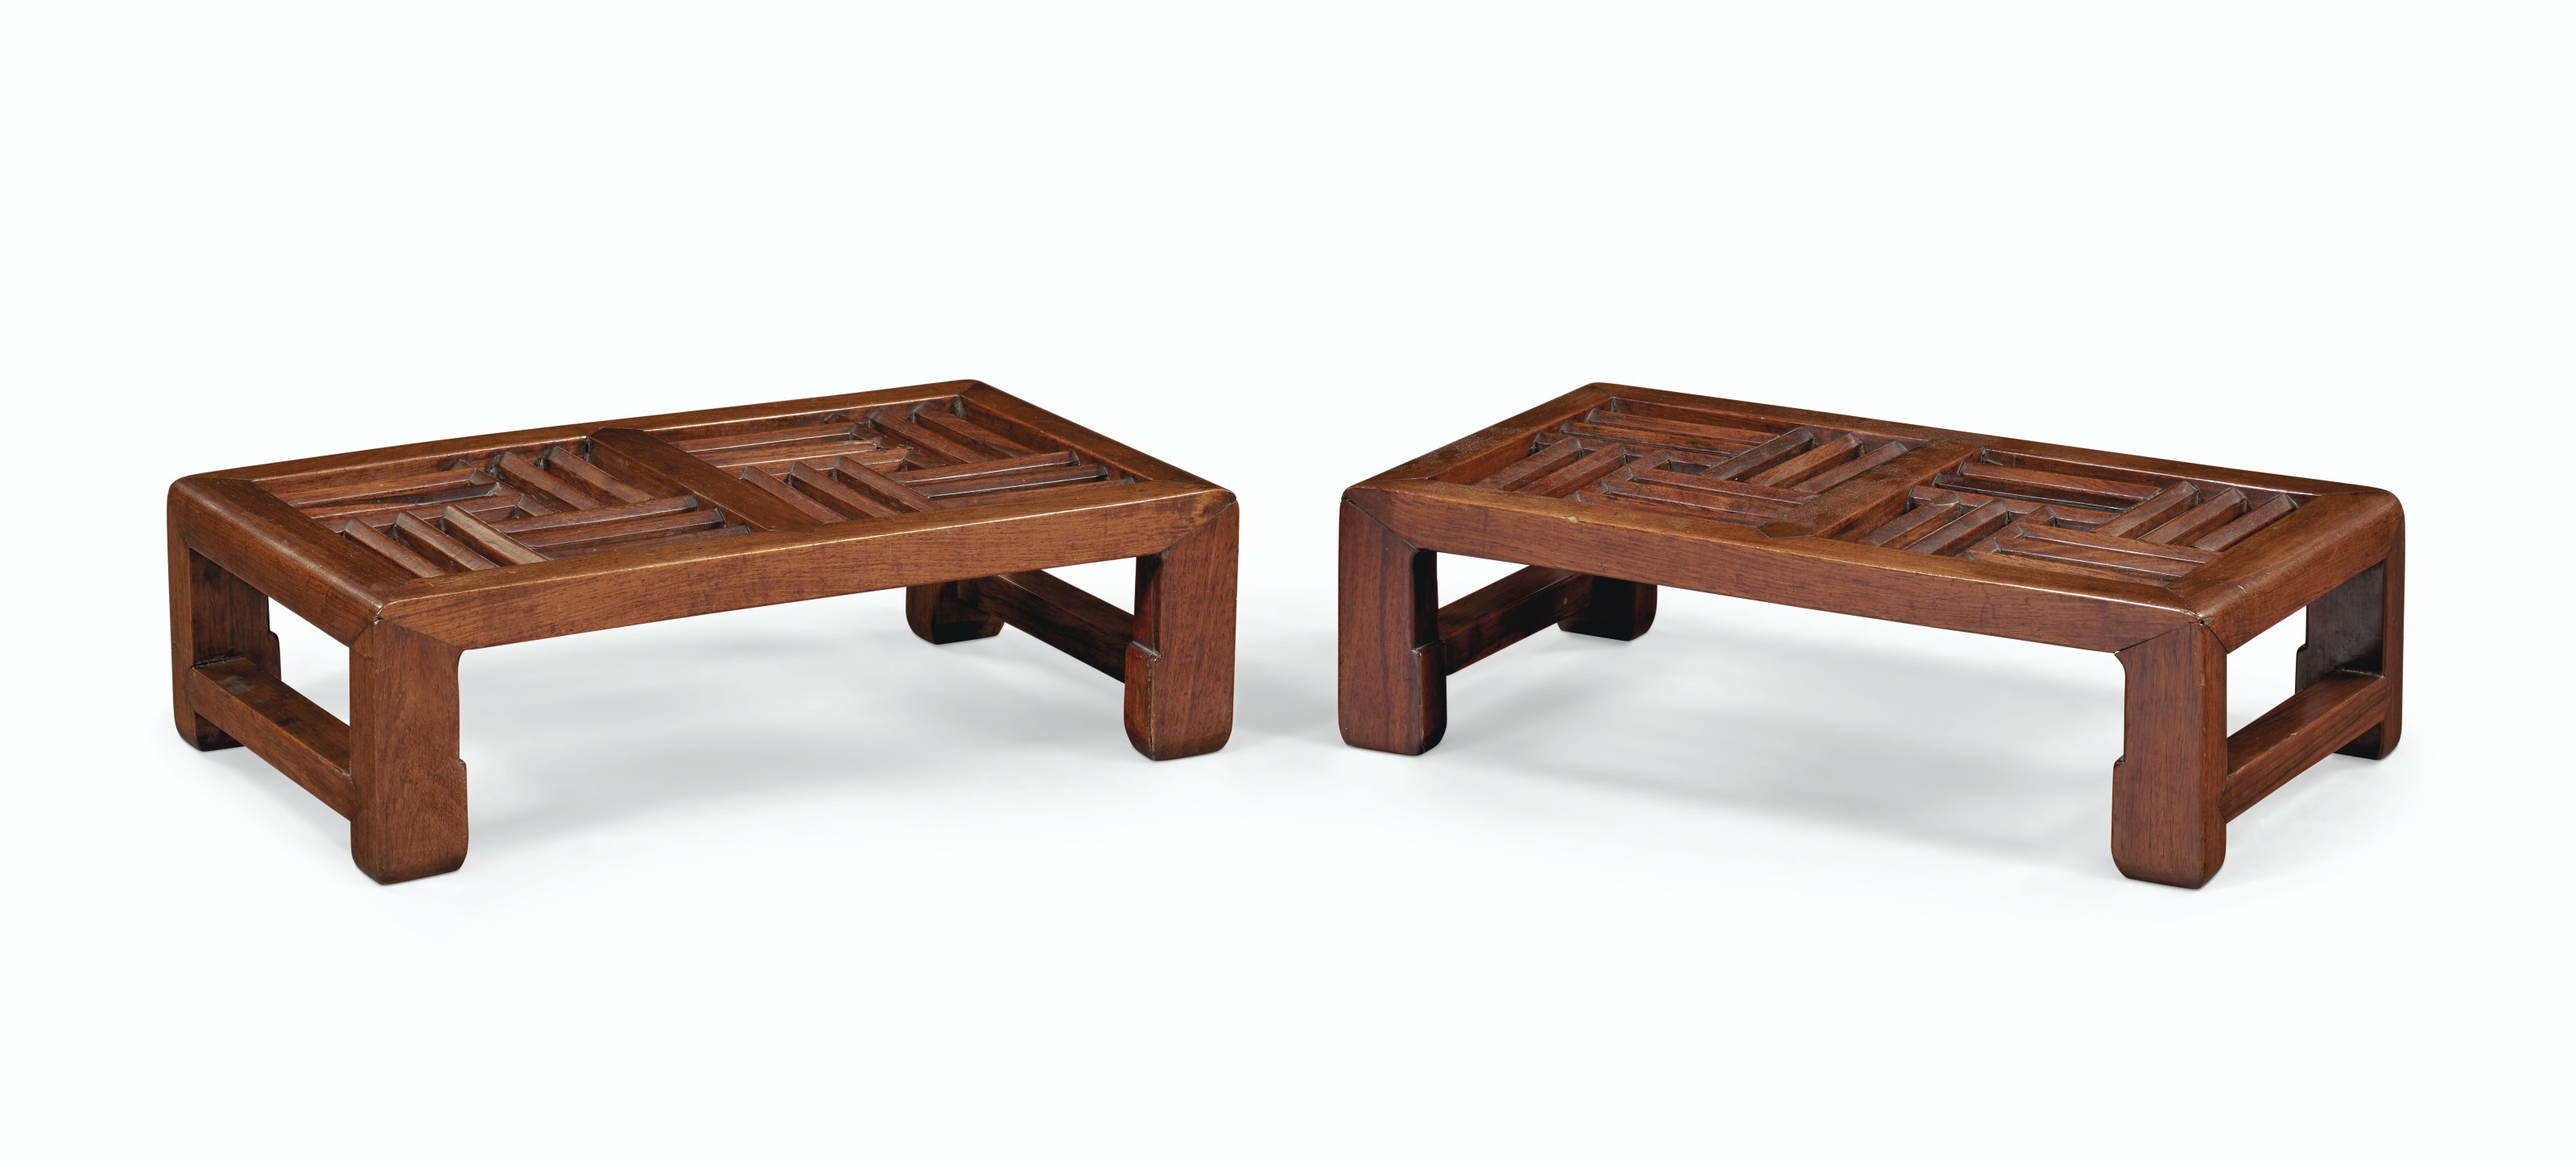 A HUANGHUALI LUOHAN BED, KANG TABLE, AND A PAIR OF HONGMU FOOT STOOLS